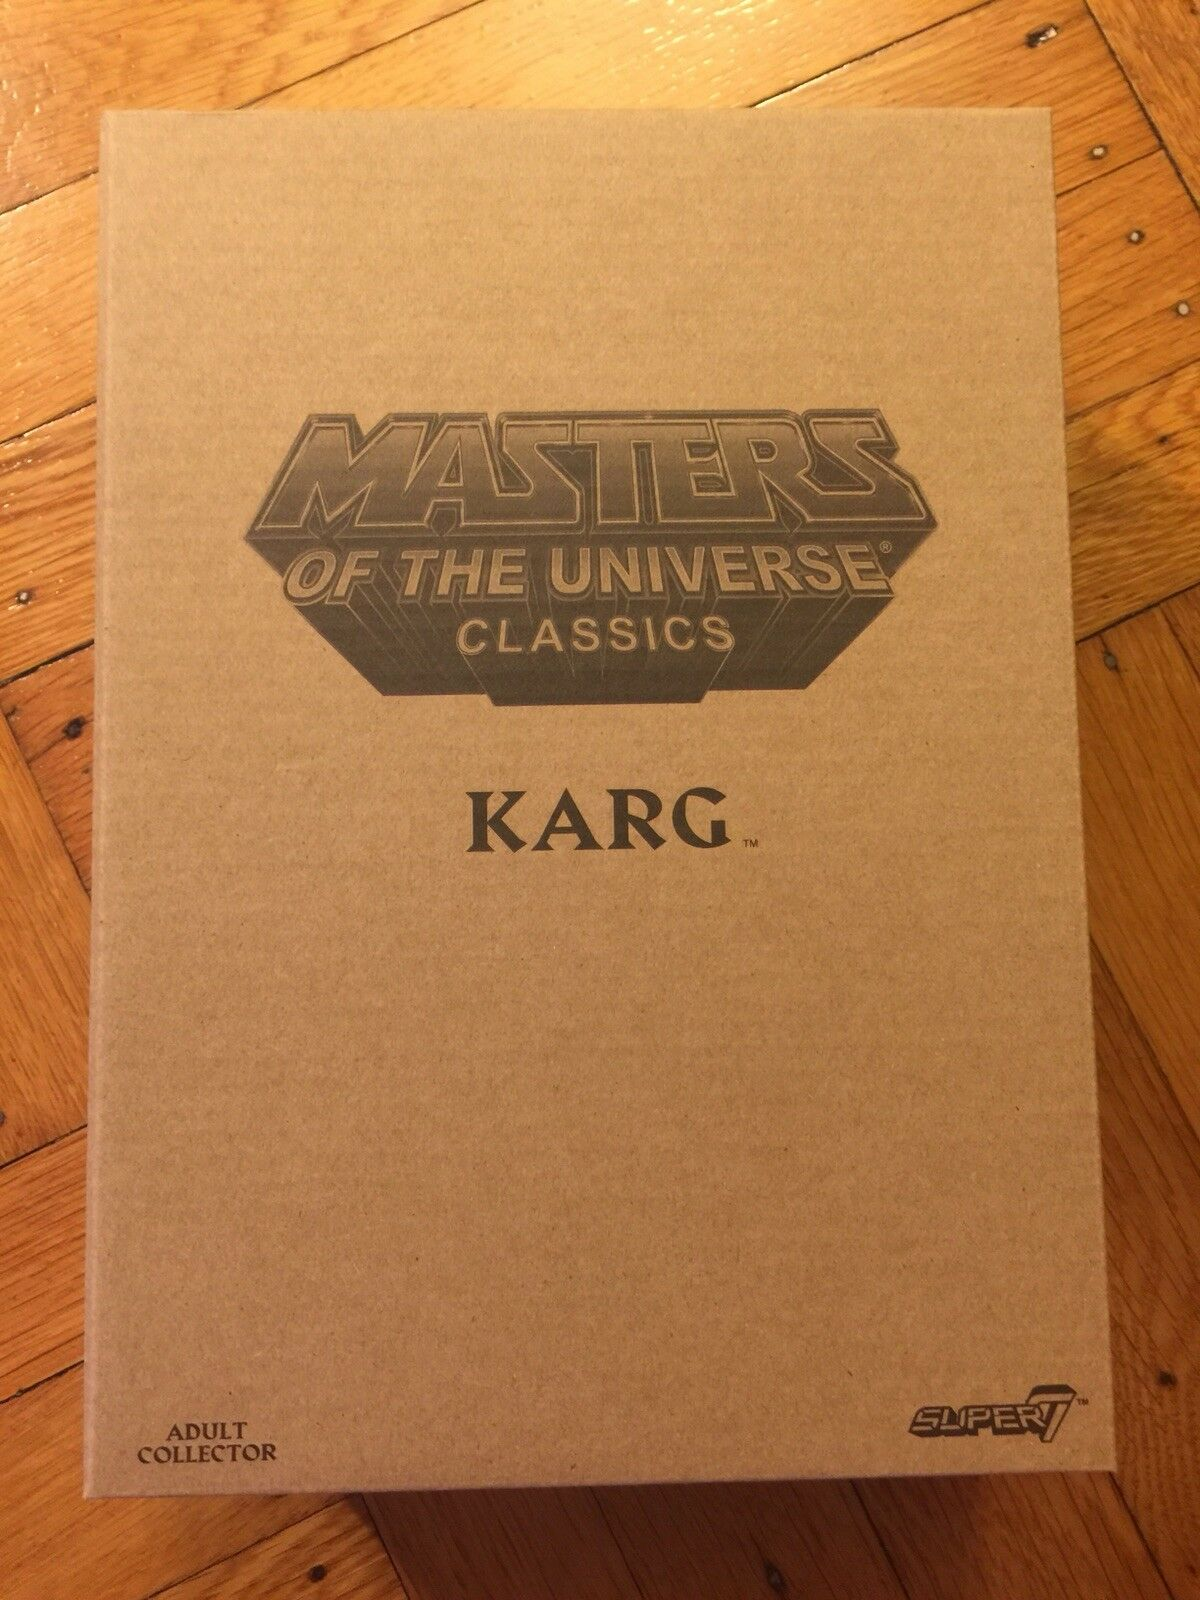 Super7 Mattel MOTUC sealed Classics Collector's Choice Karg Figure IN HAND